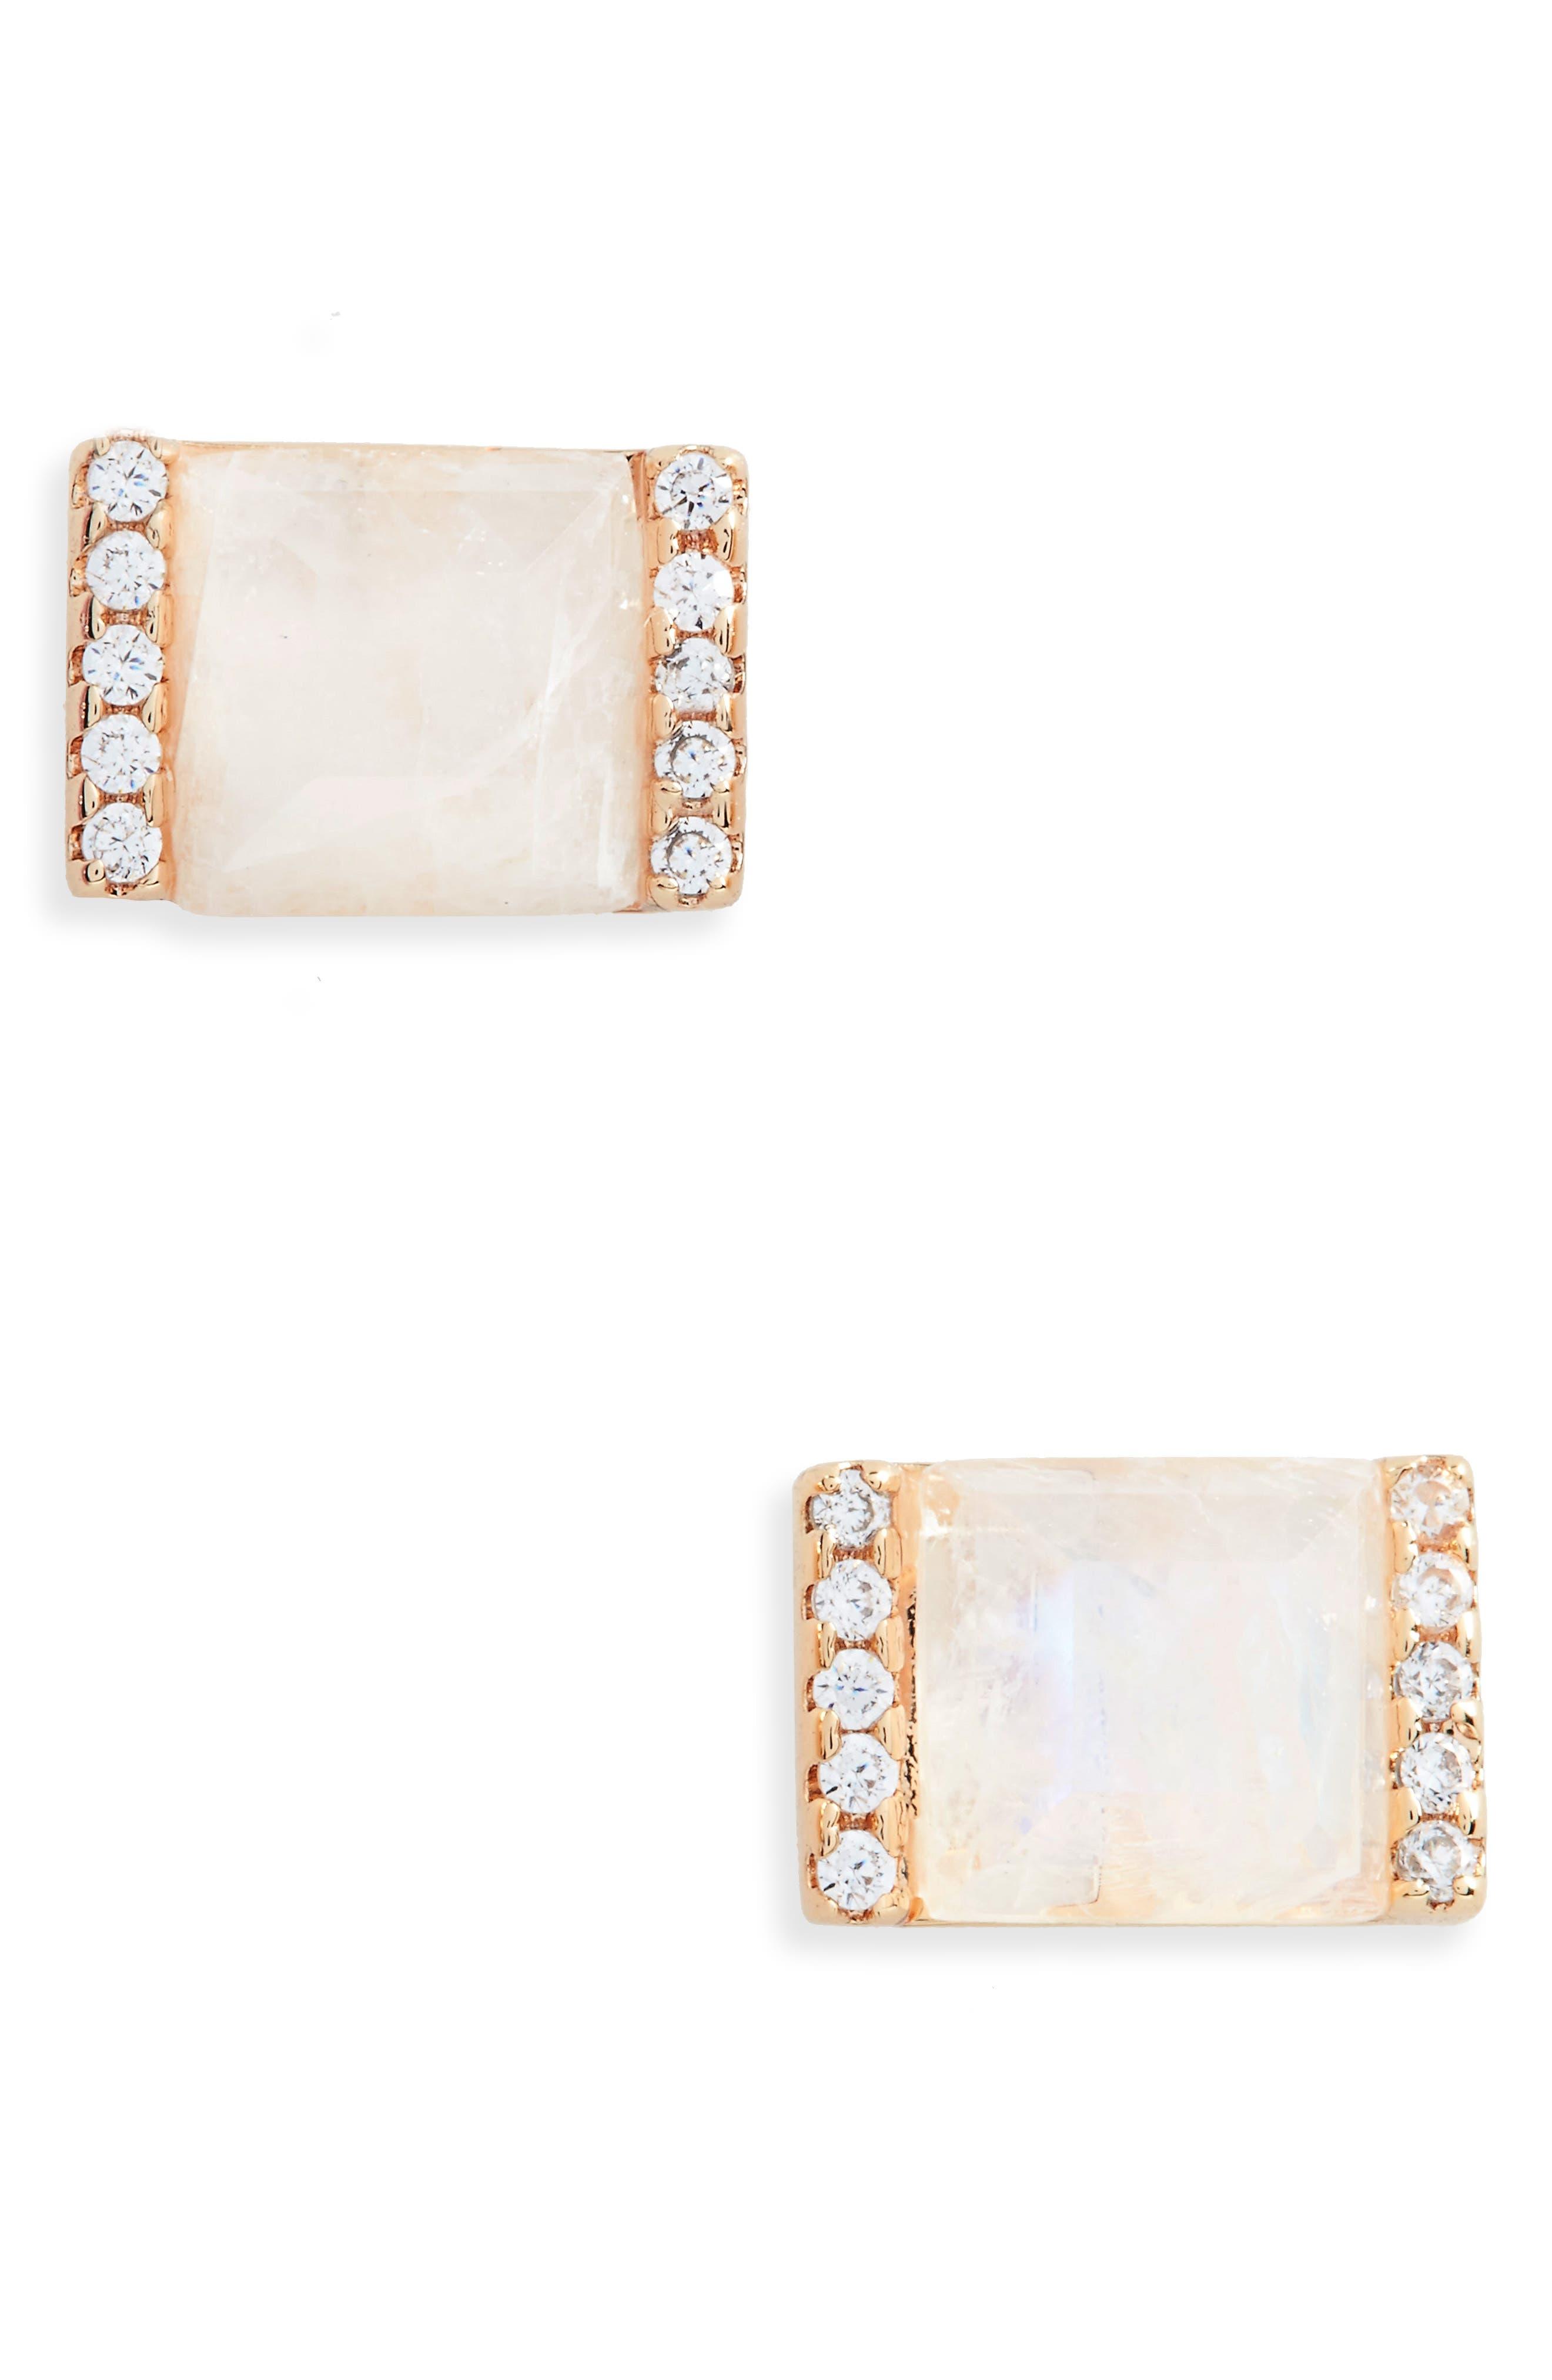 Vero Stud Earrings,                         Main,                         color, Moonstone/ Gold